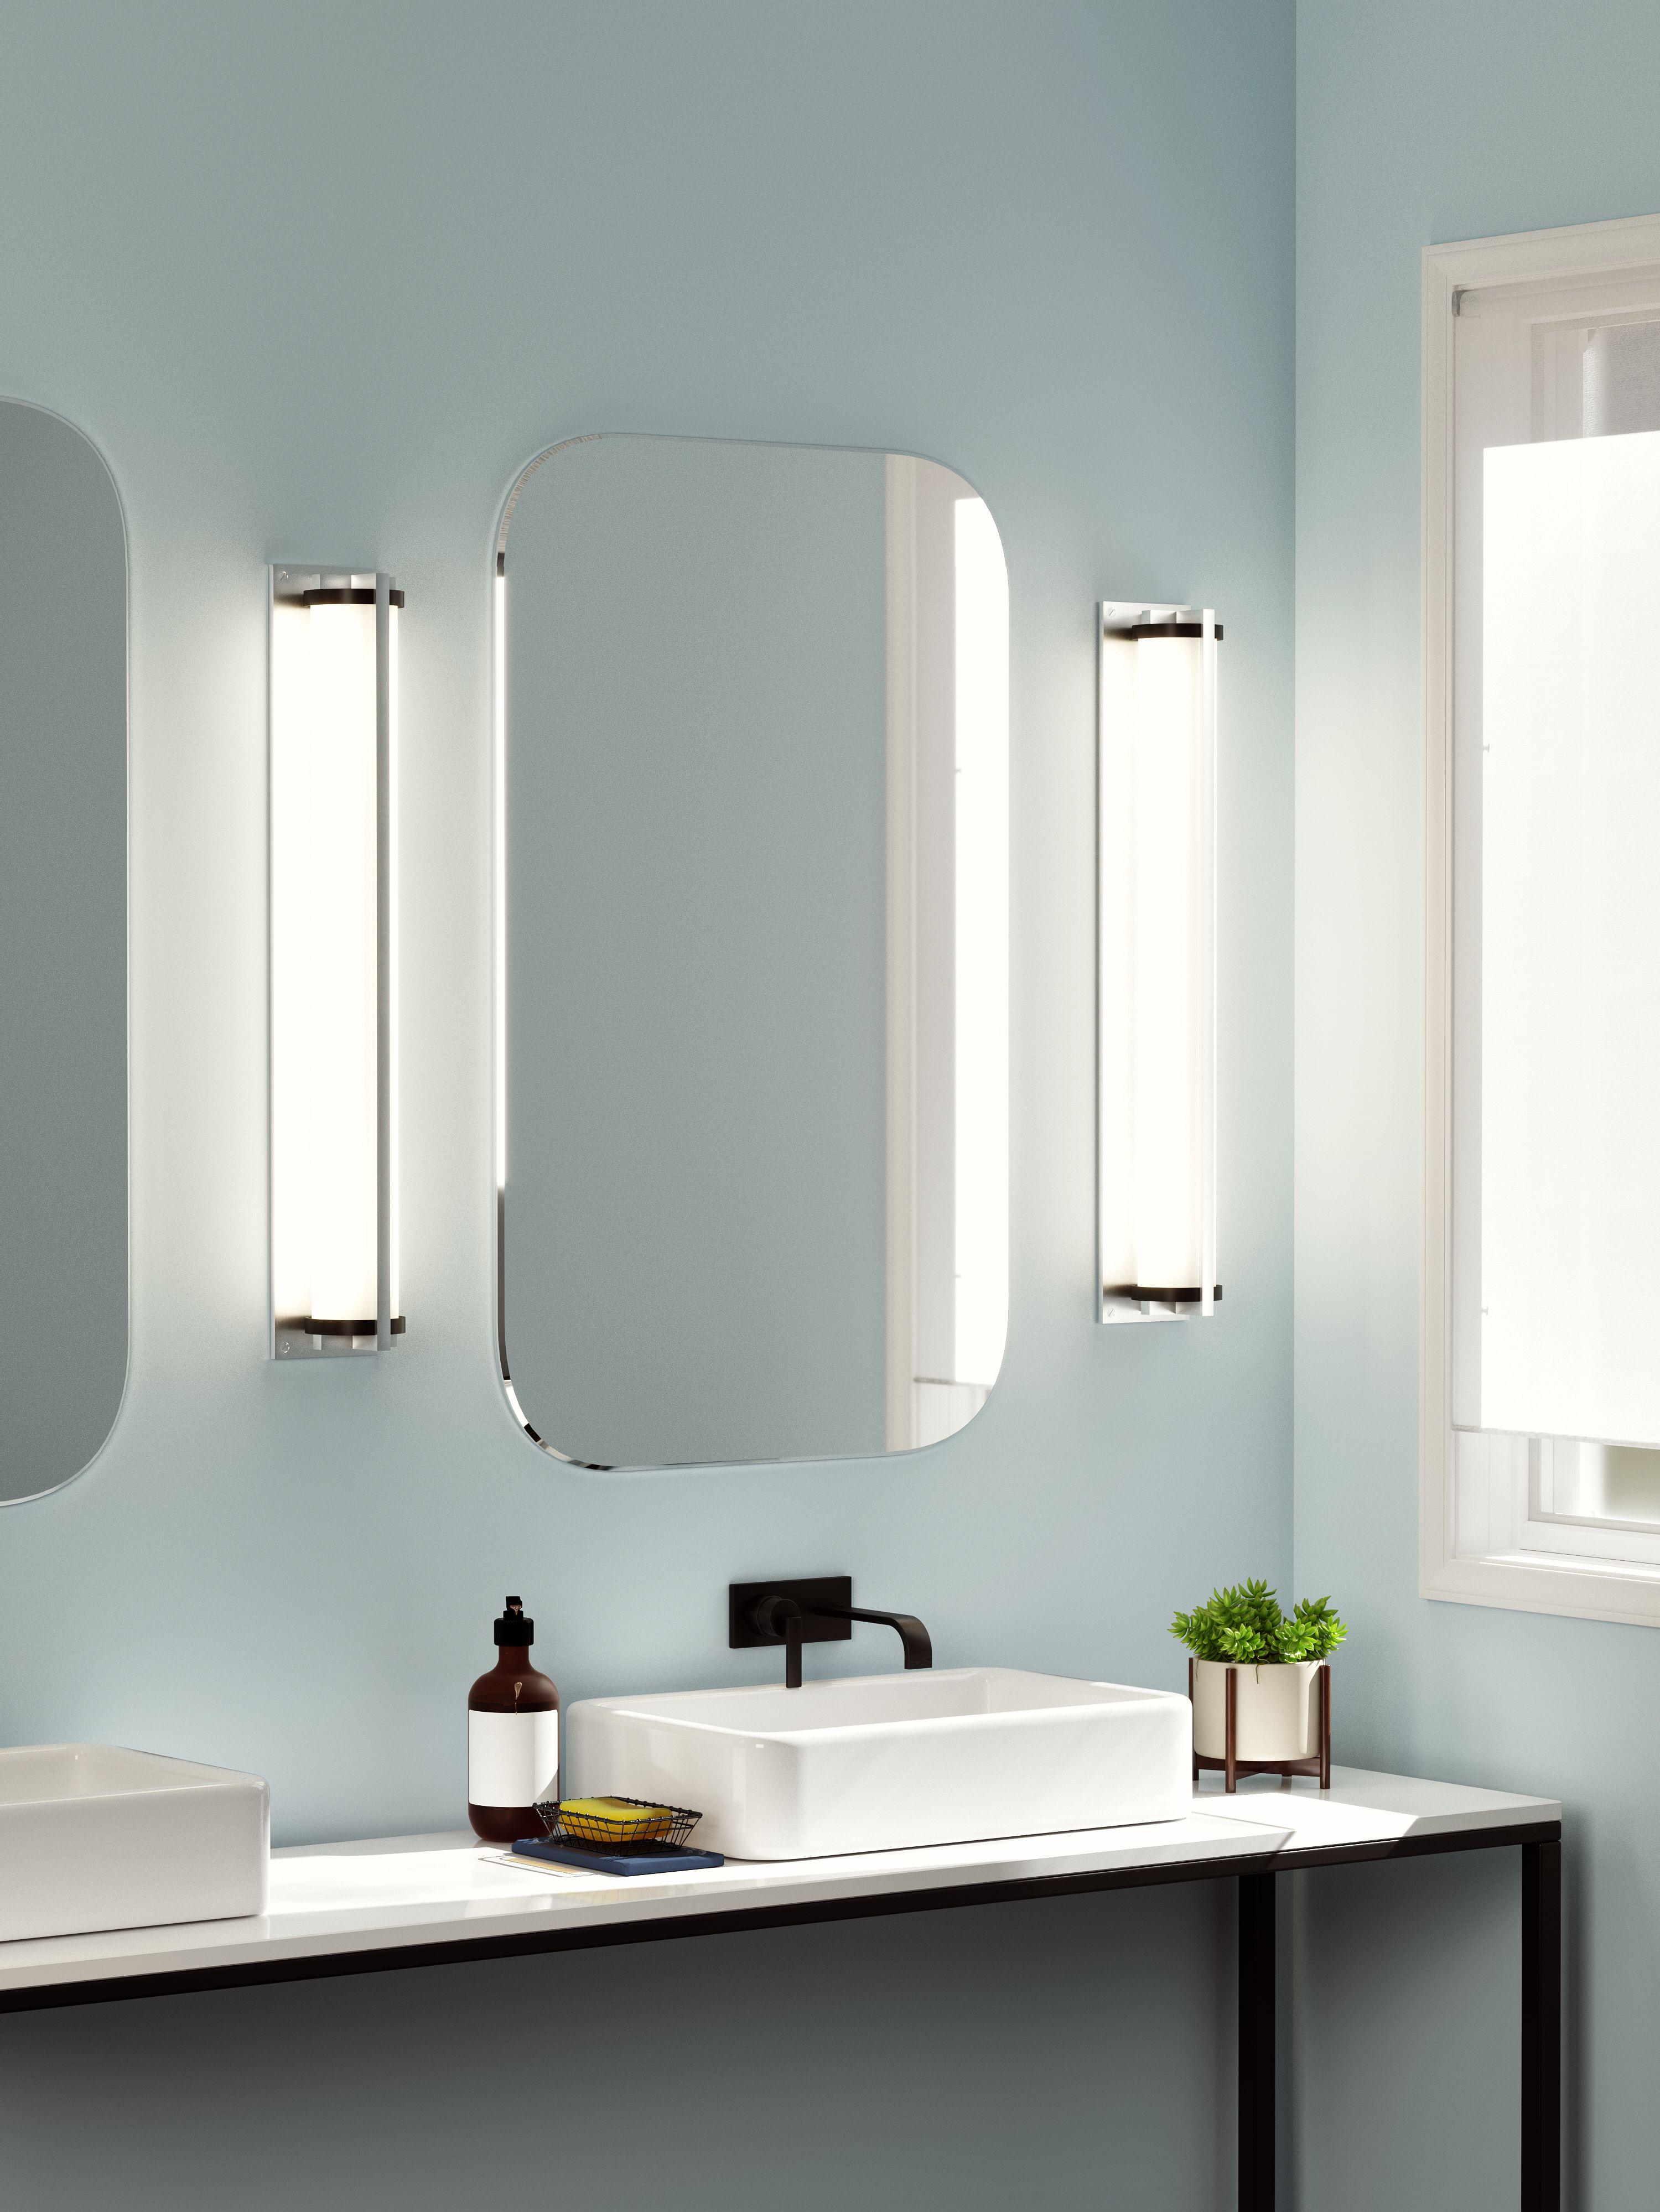 Metropolis Wall Sconce | Bathroom mirror lights, Bathroom ...